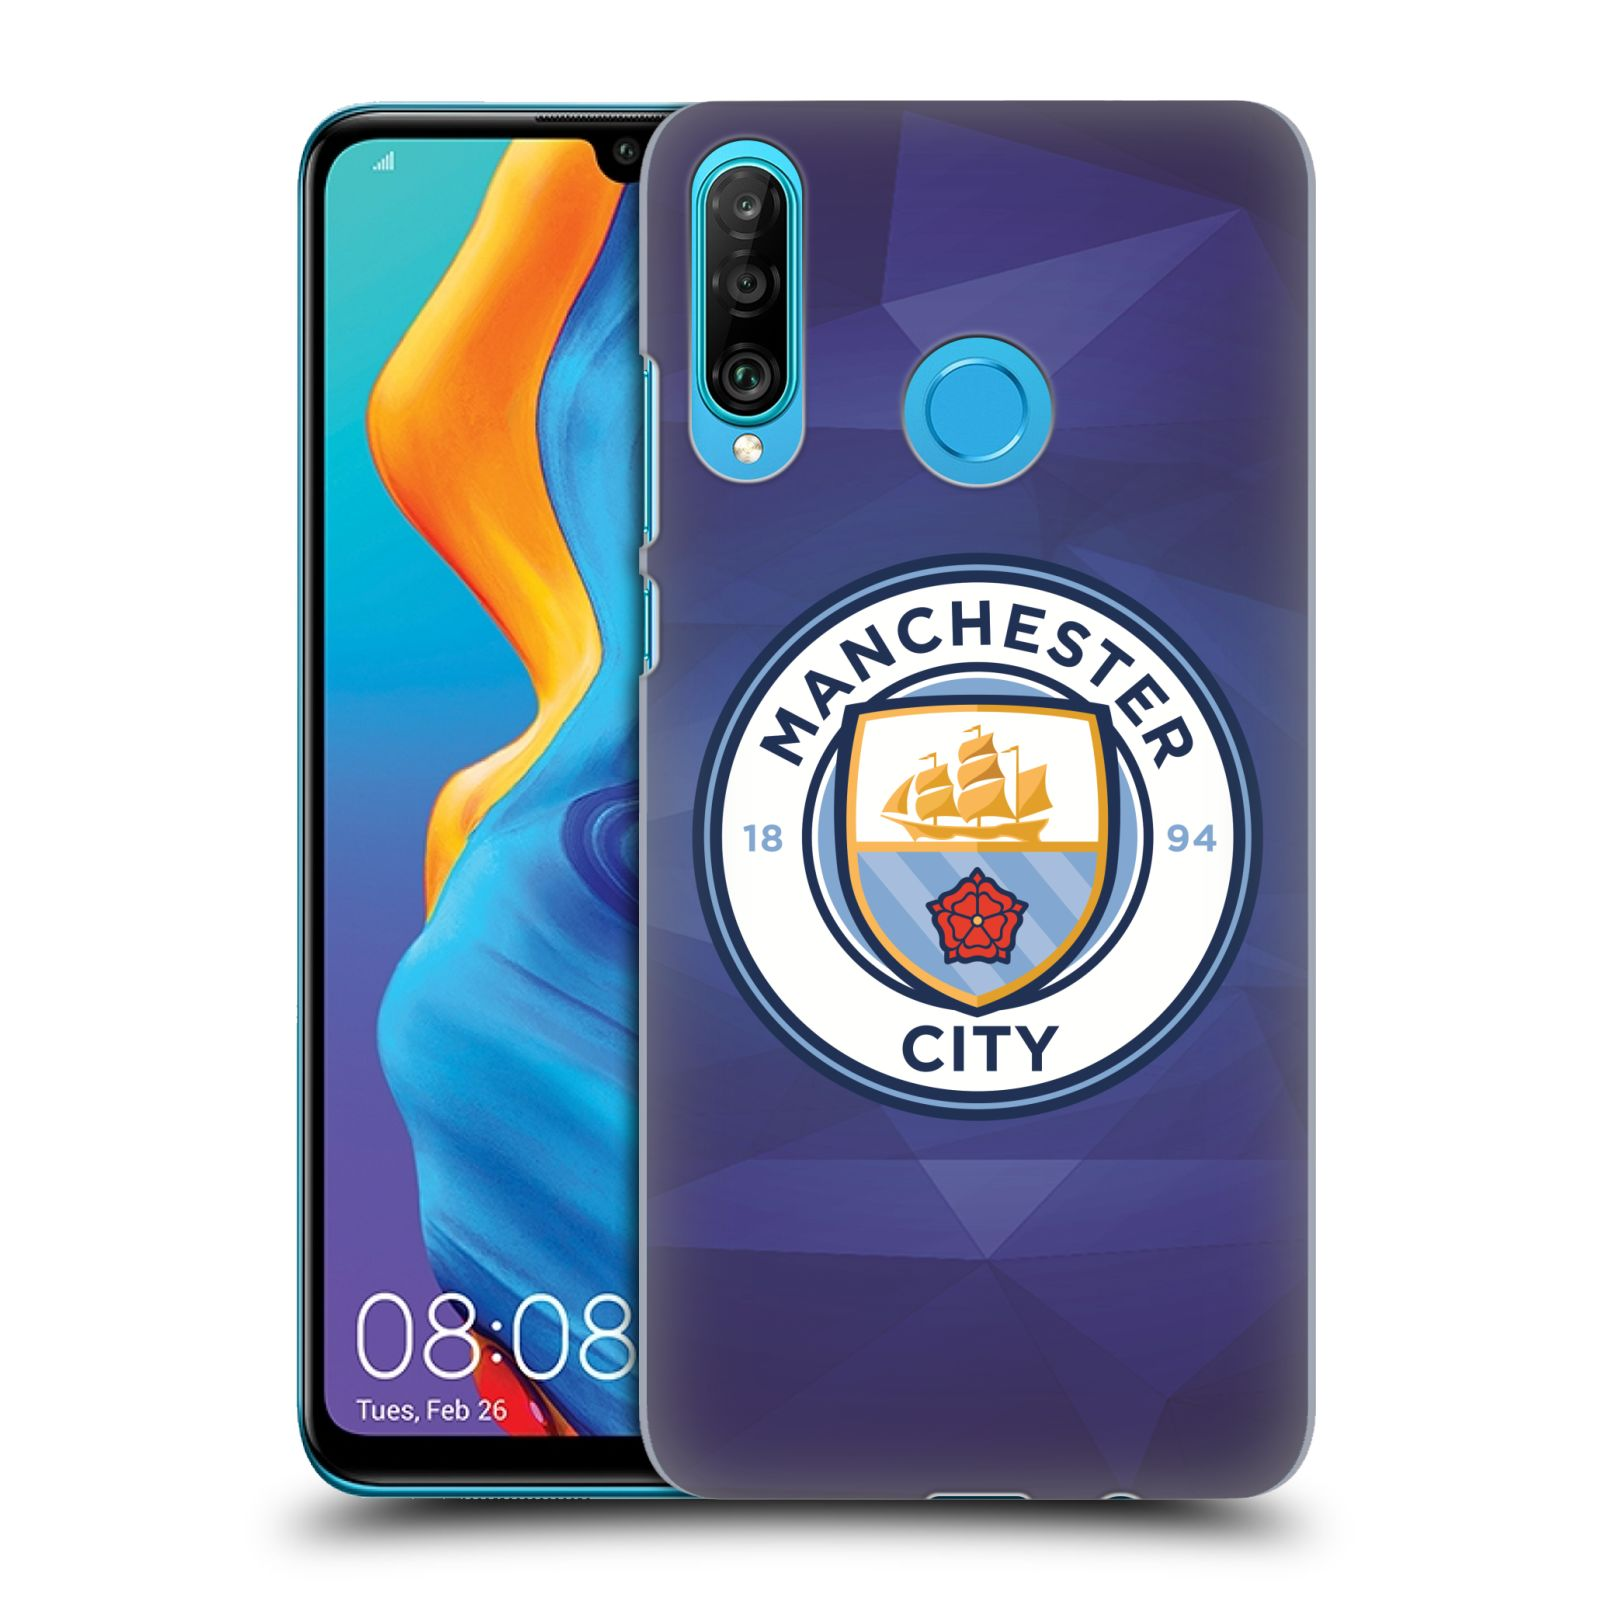 Plastové pouzdro na mobil Huawei P30 Lite - Head Case - Manchester City FC - Modré nové logo